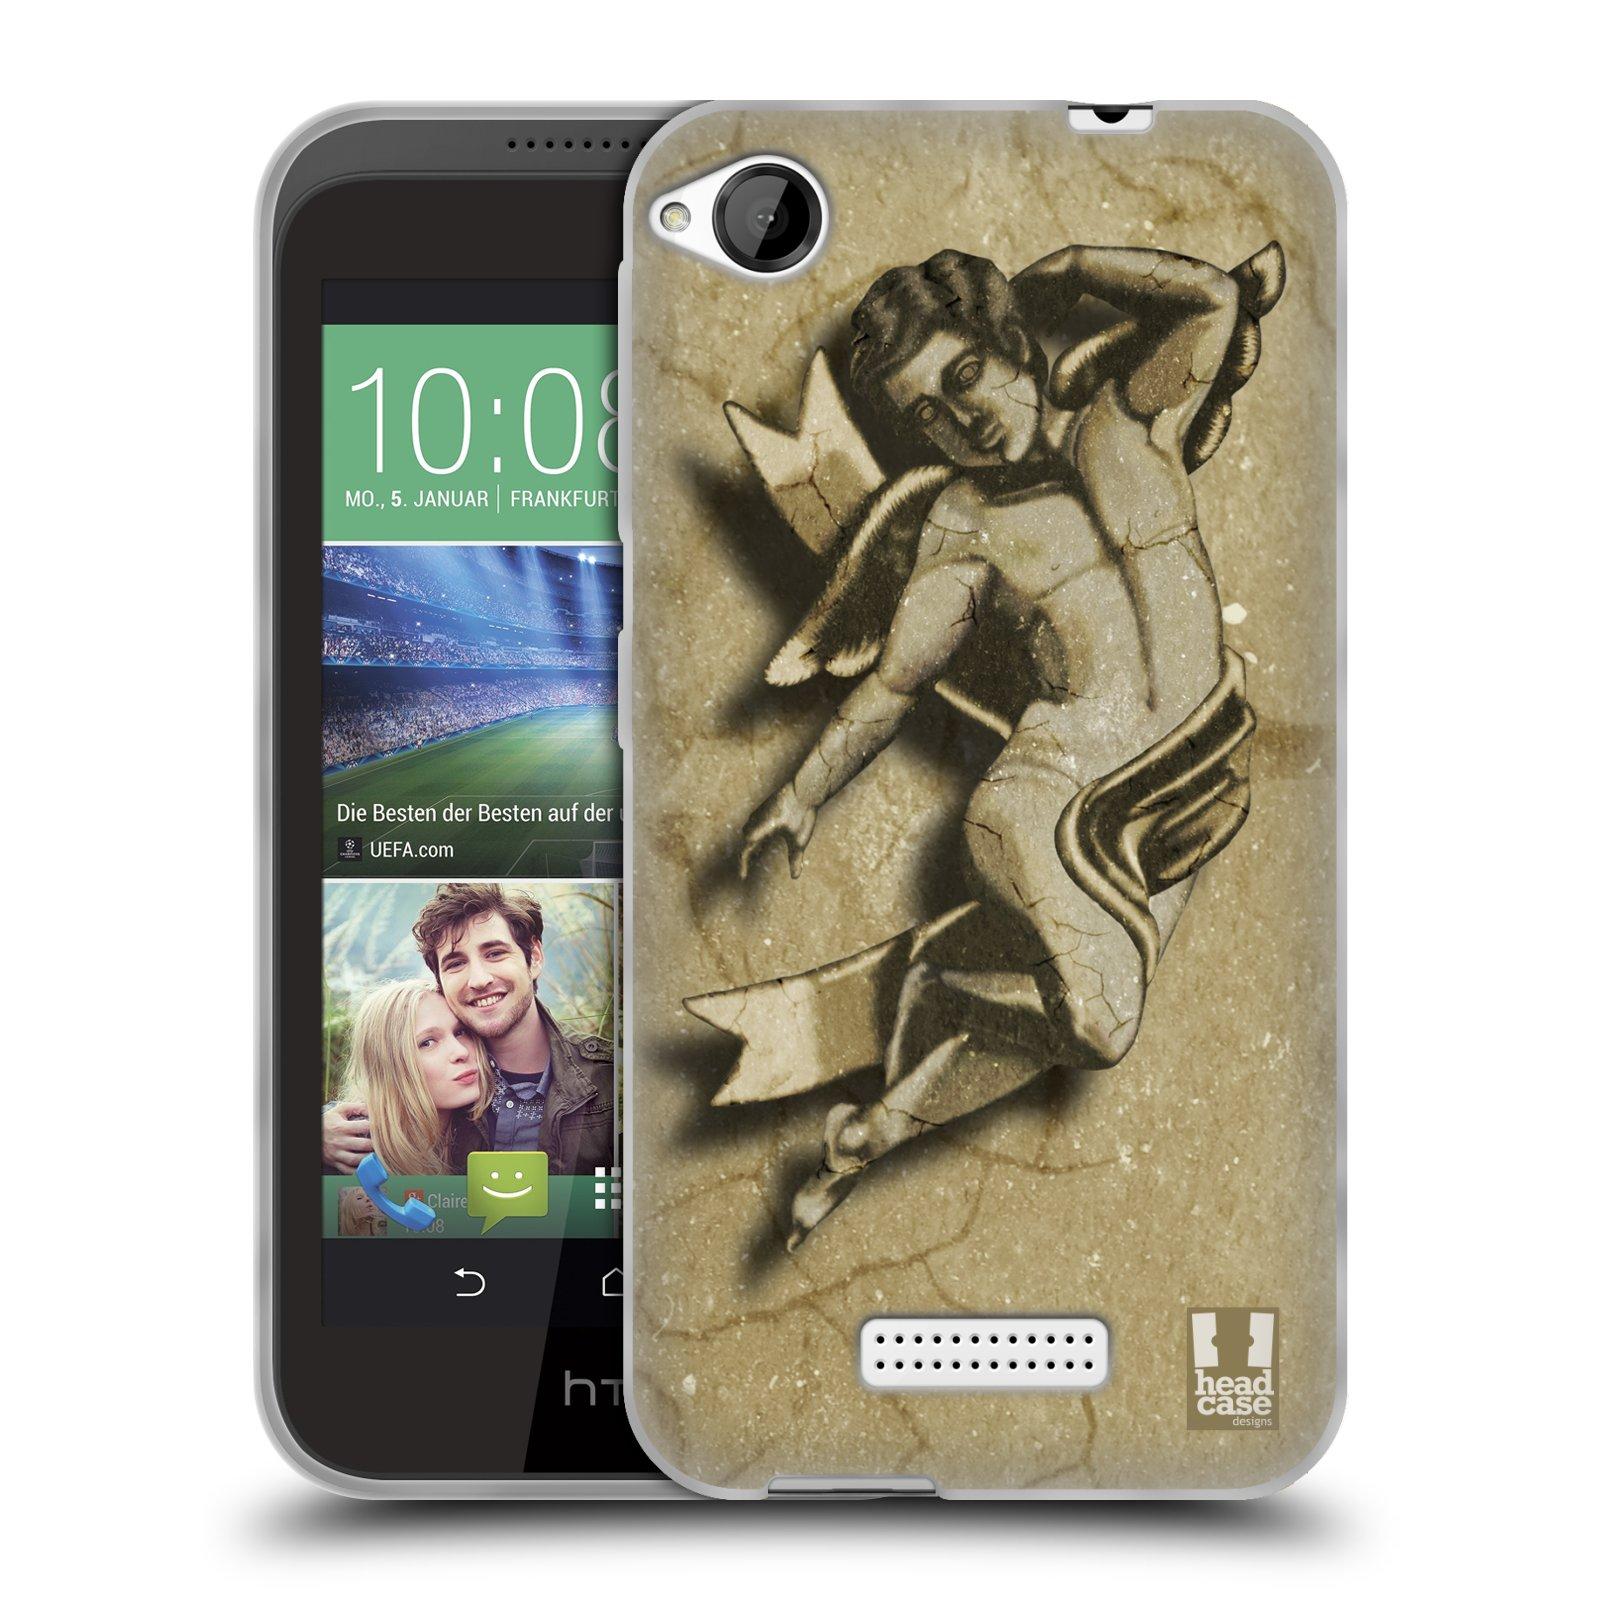 HEAD CASE silikonový obal na mobil HTC DESIRE 320 vzor Andělé z kamene LAYLAND